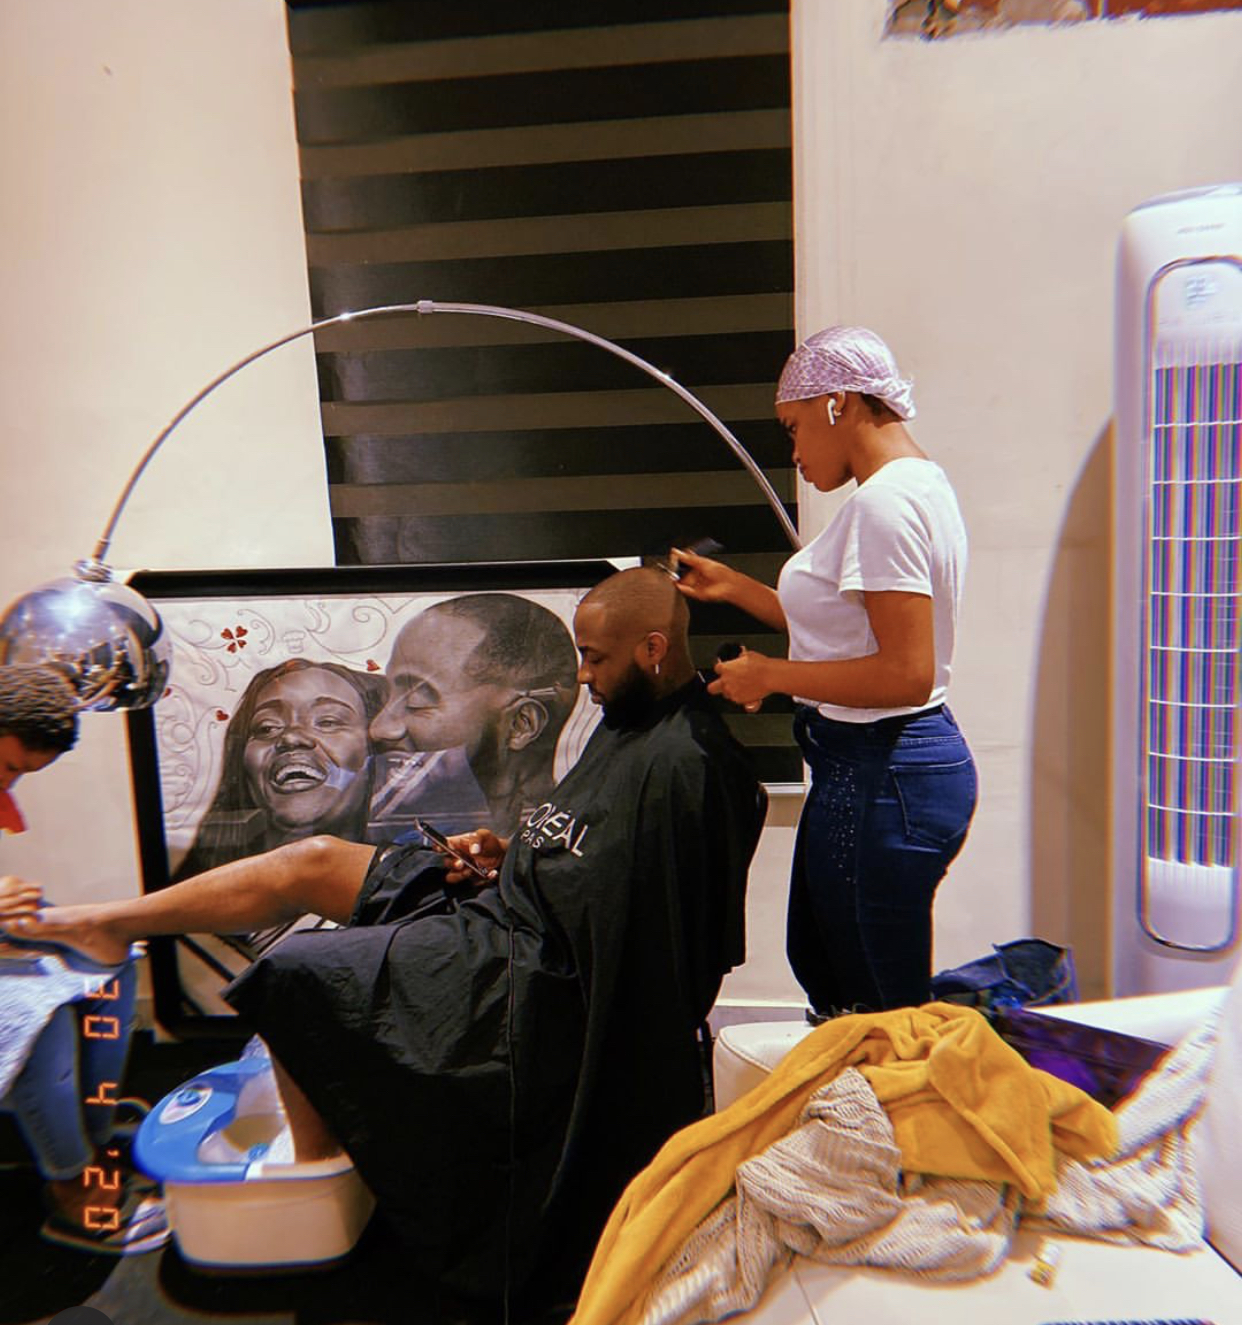 Nigerian singer, Davido getting a haircut done by a female barber